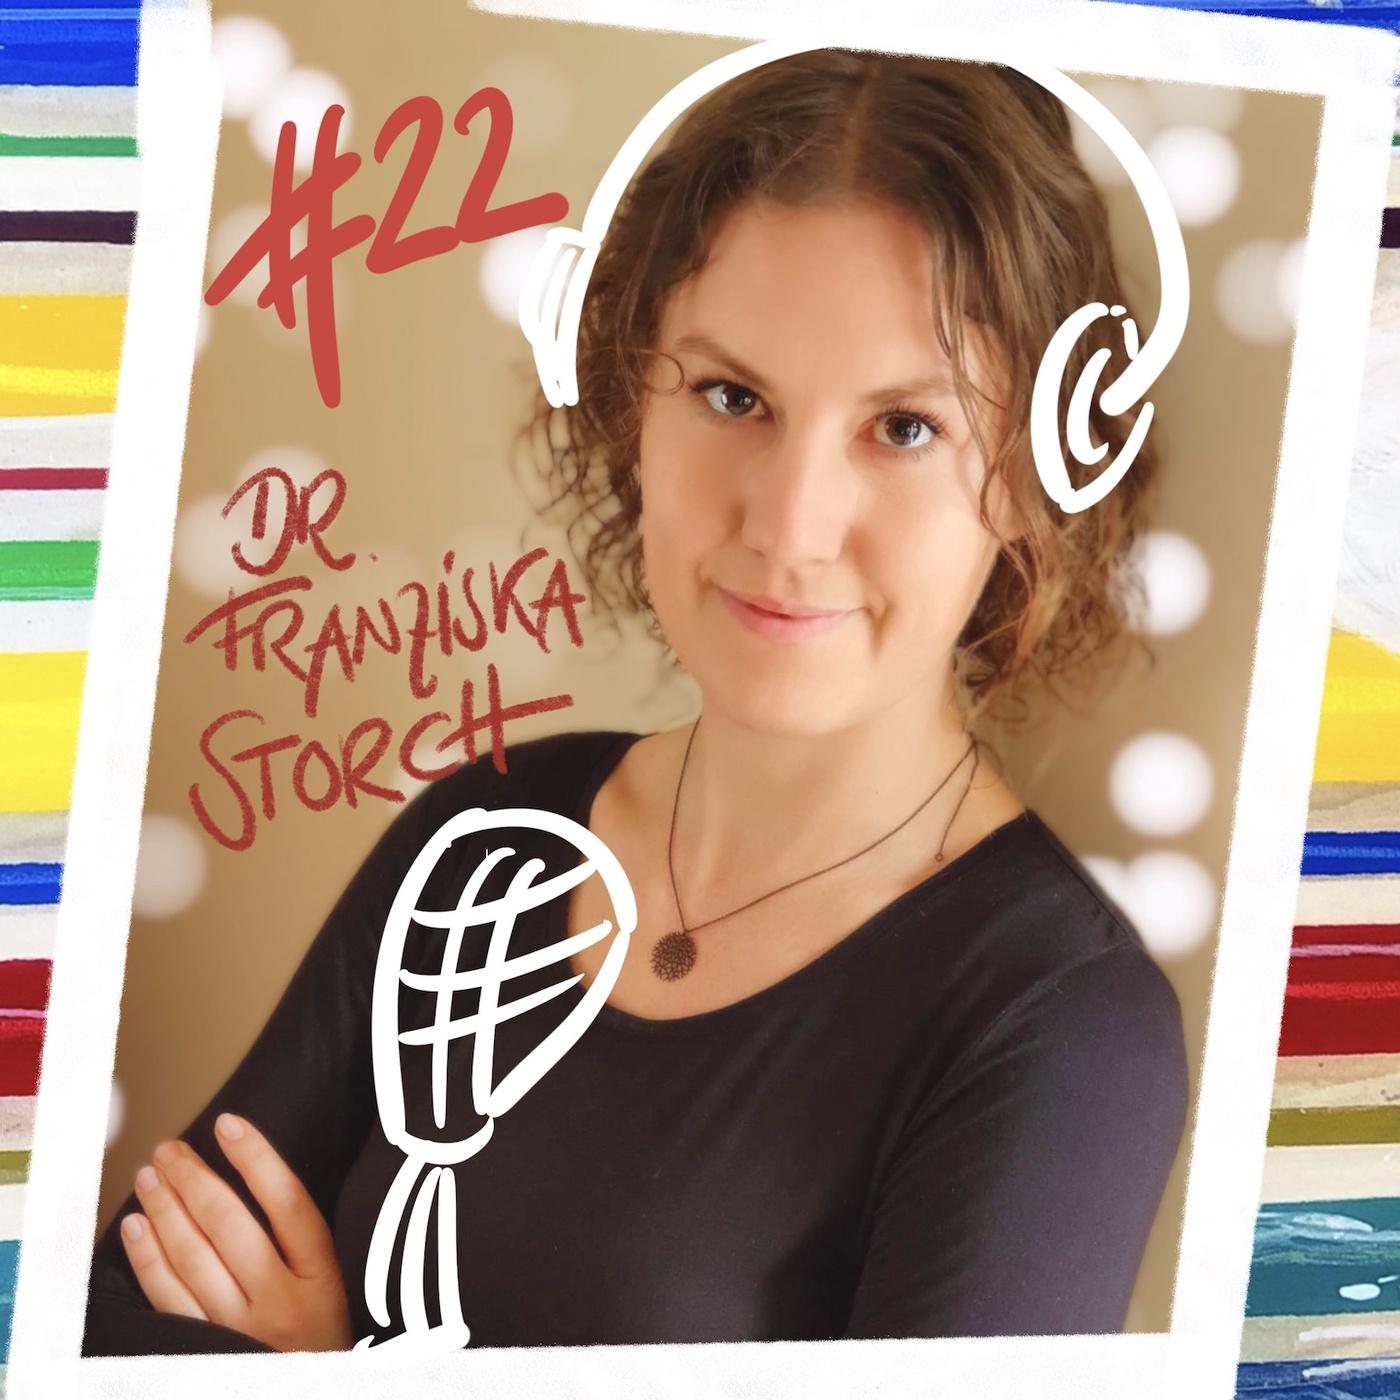 #22 Dr. Franziska Storch - Kunsthistorikerin - Gründerin SALOON - Hamburg